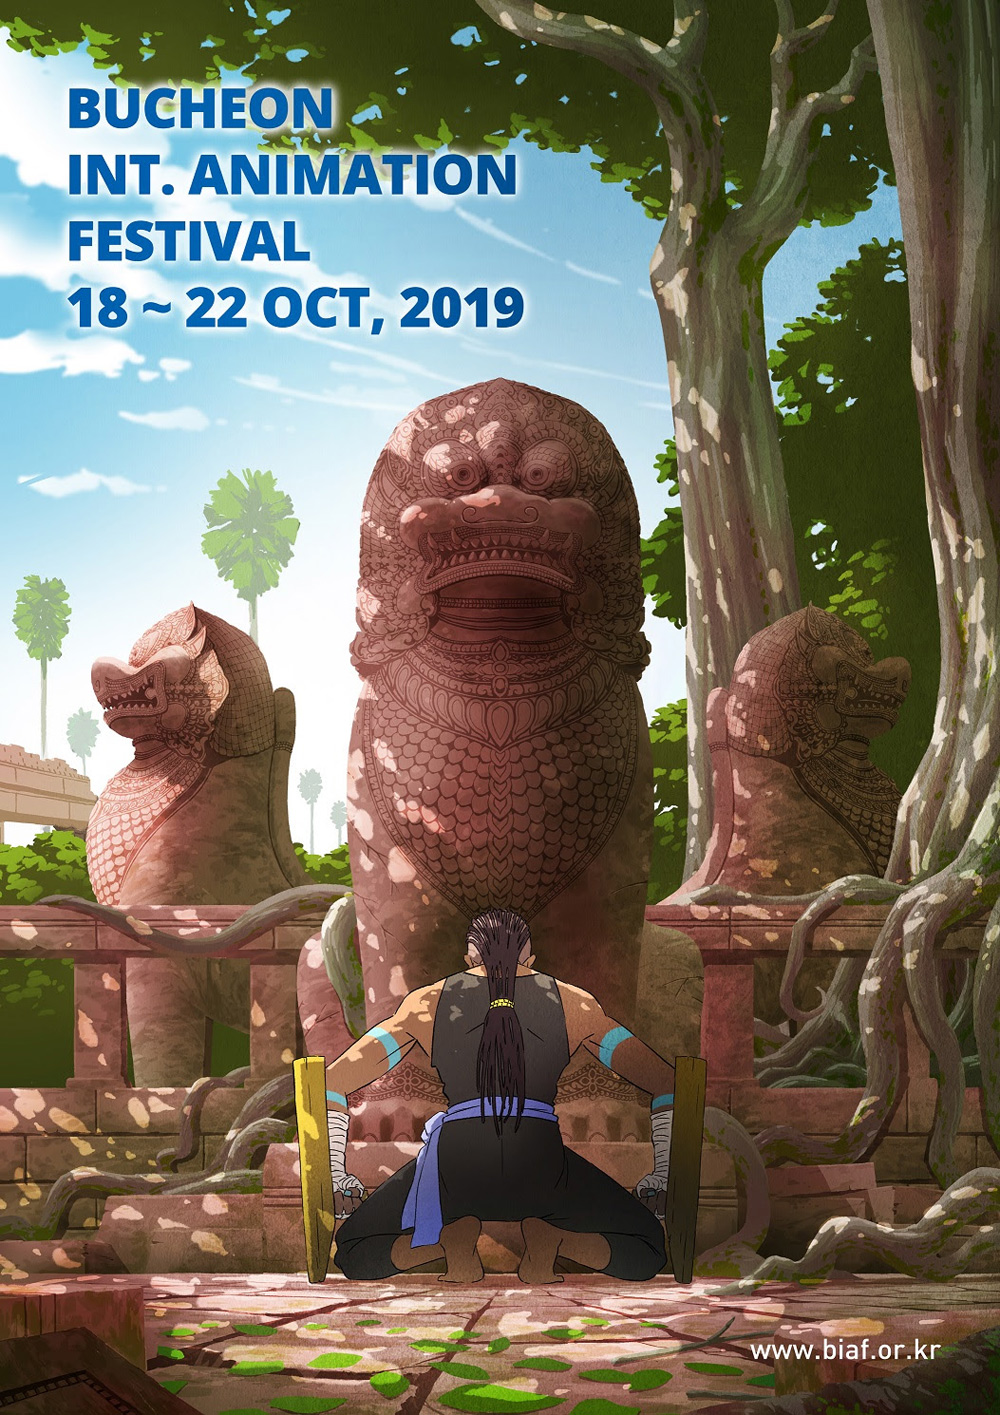 21st Bucheon International Animation Festival